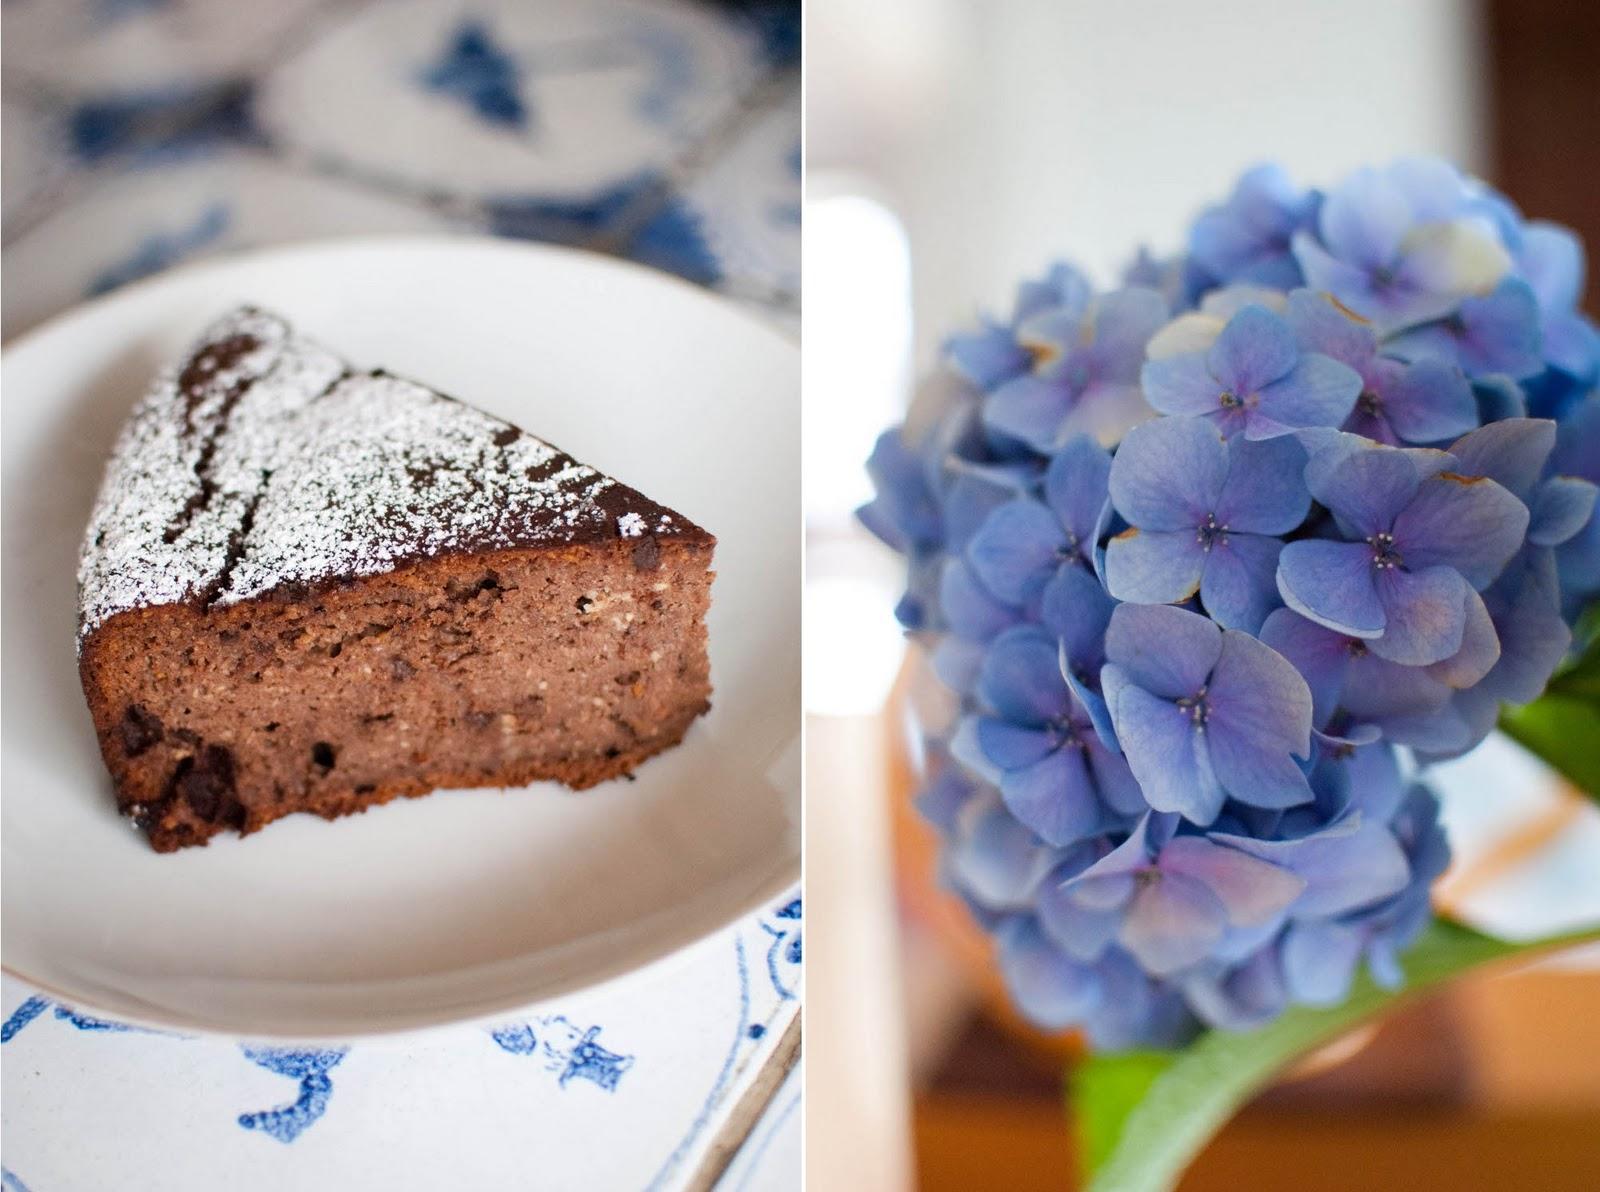 Scandi Home Healthy Birthday Cake Almond Hazelnut Orange And